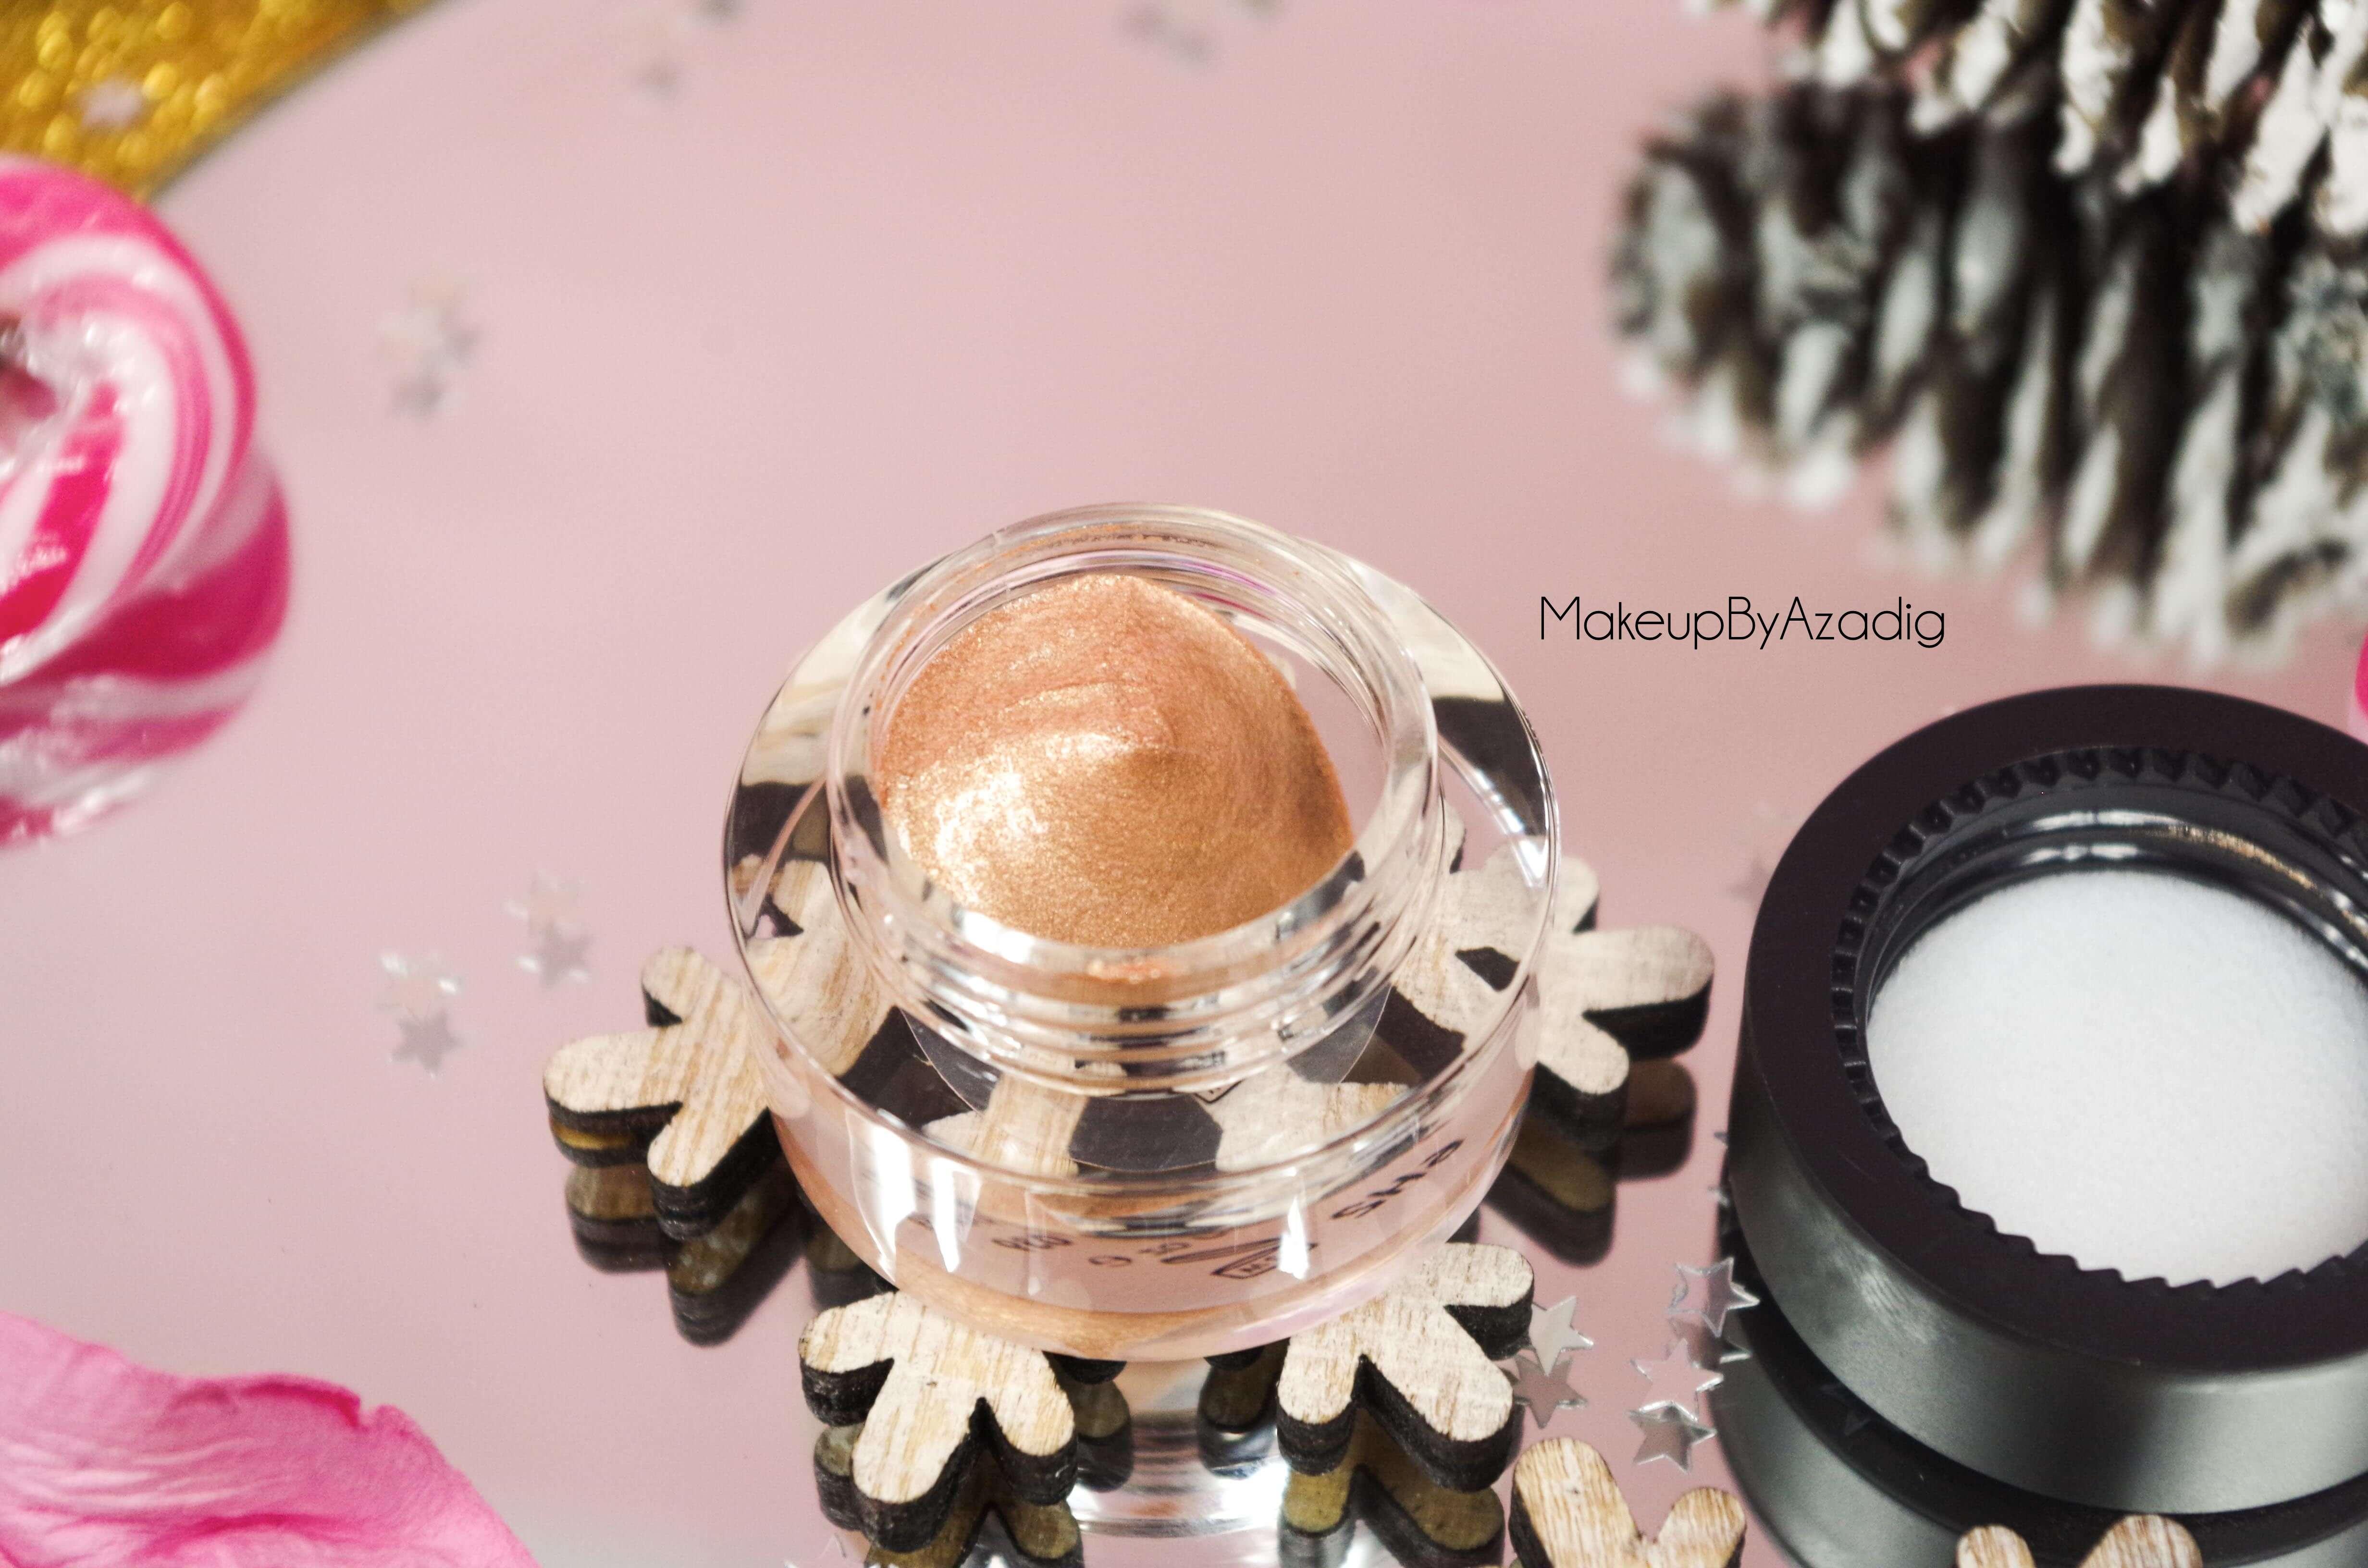 highlighter-sleek-makeup-strobing-souffle-smoky-quartz-sephora-swatch-makeupbyazadig-avis-cream